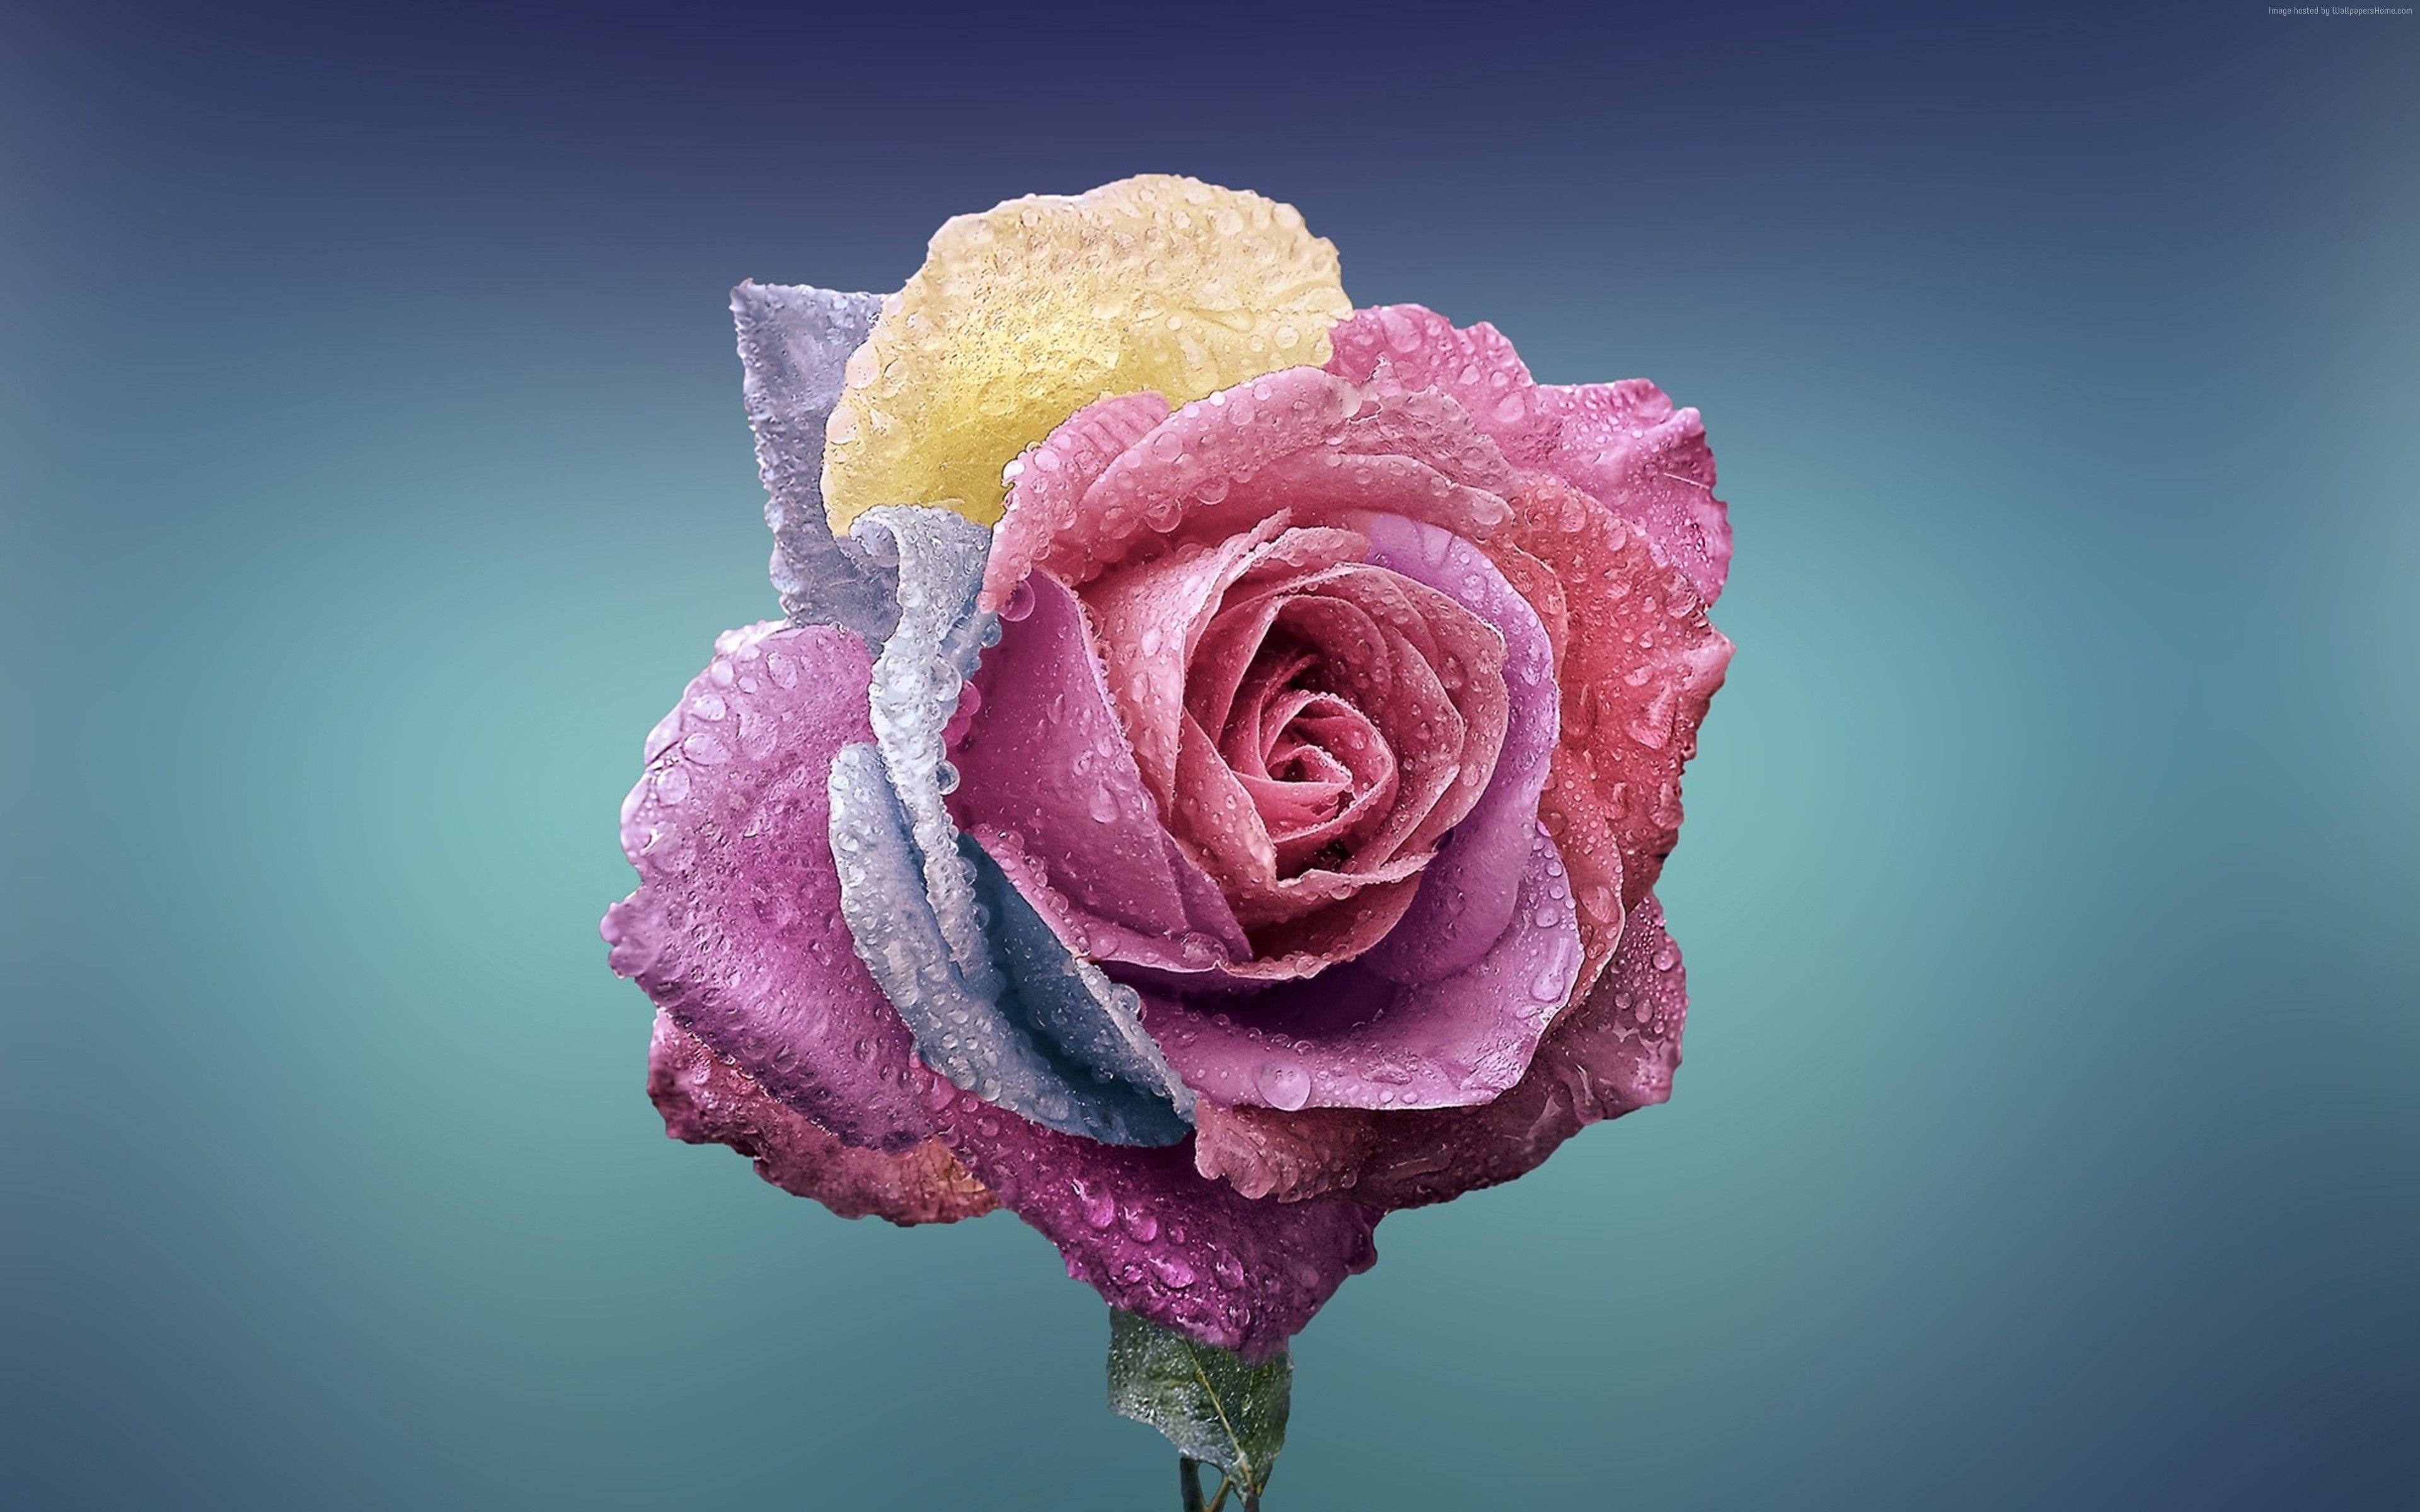 Roses Flower 4k Wallpapers Wallpaper Cave